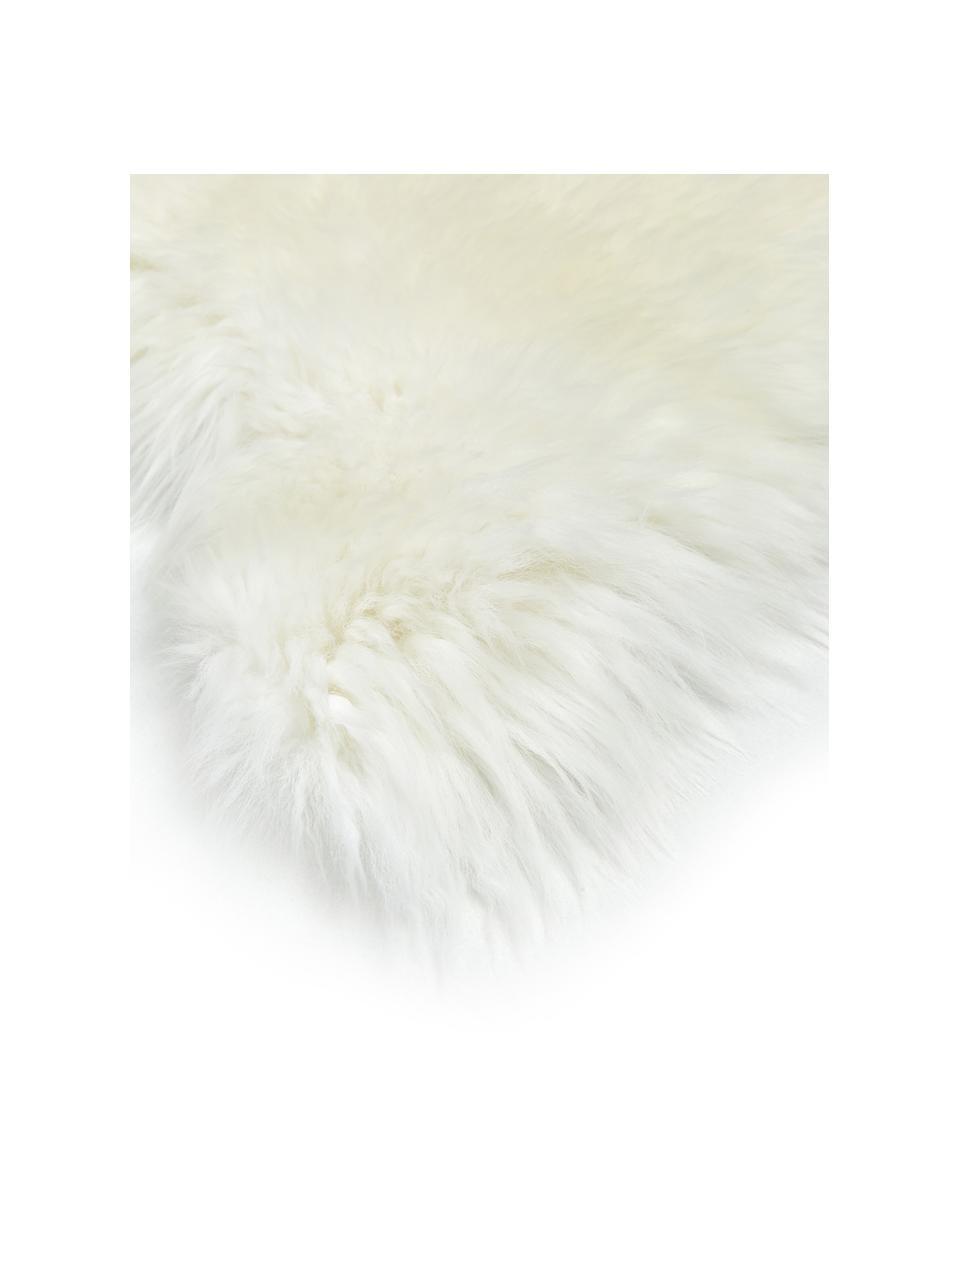 Pelle di pecora liscia Oslo, Retro: 100% pelle rivestita senz, Bianco crema, Larg. 60 x Lung. 90 cm